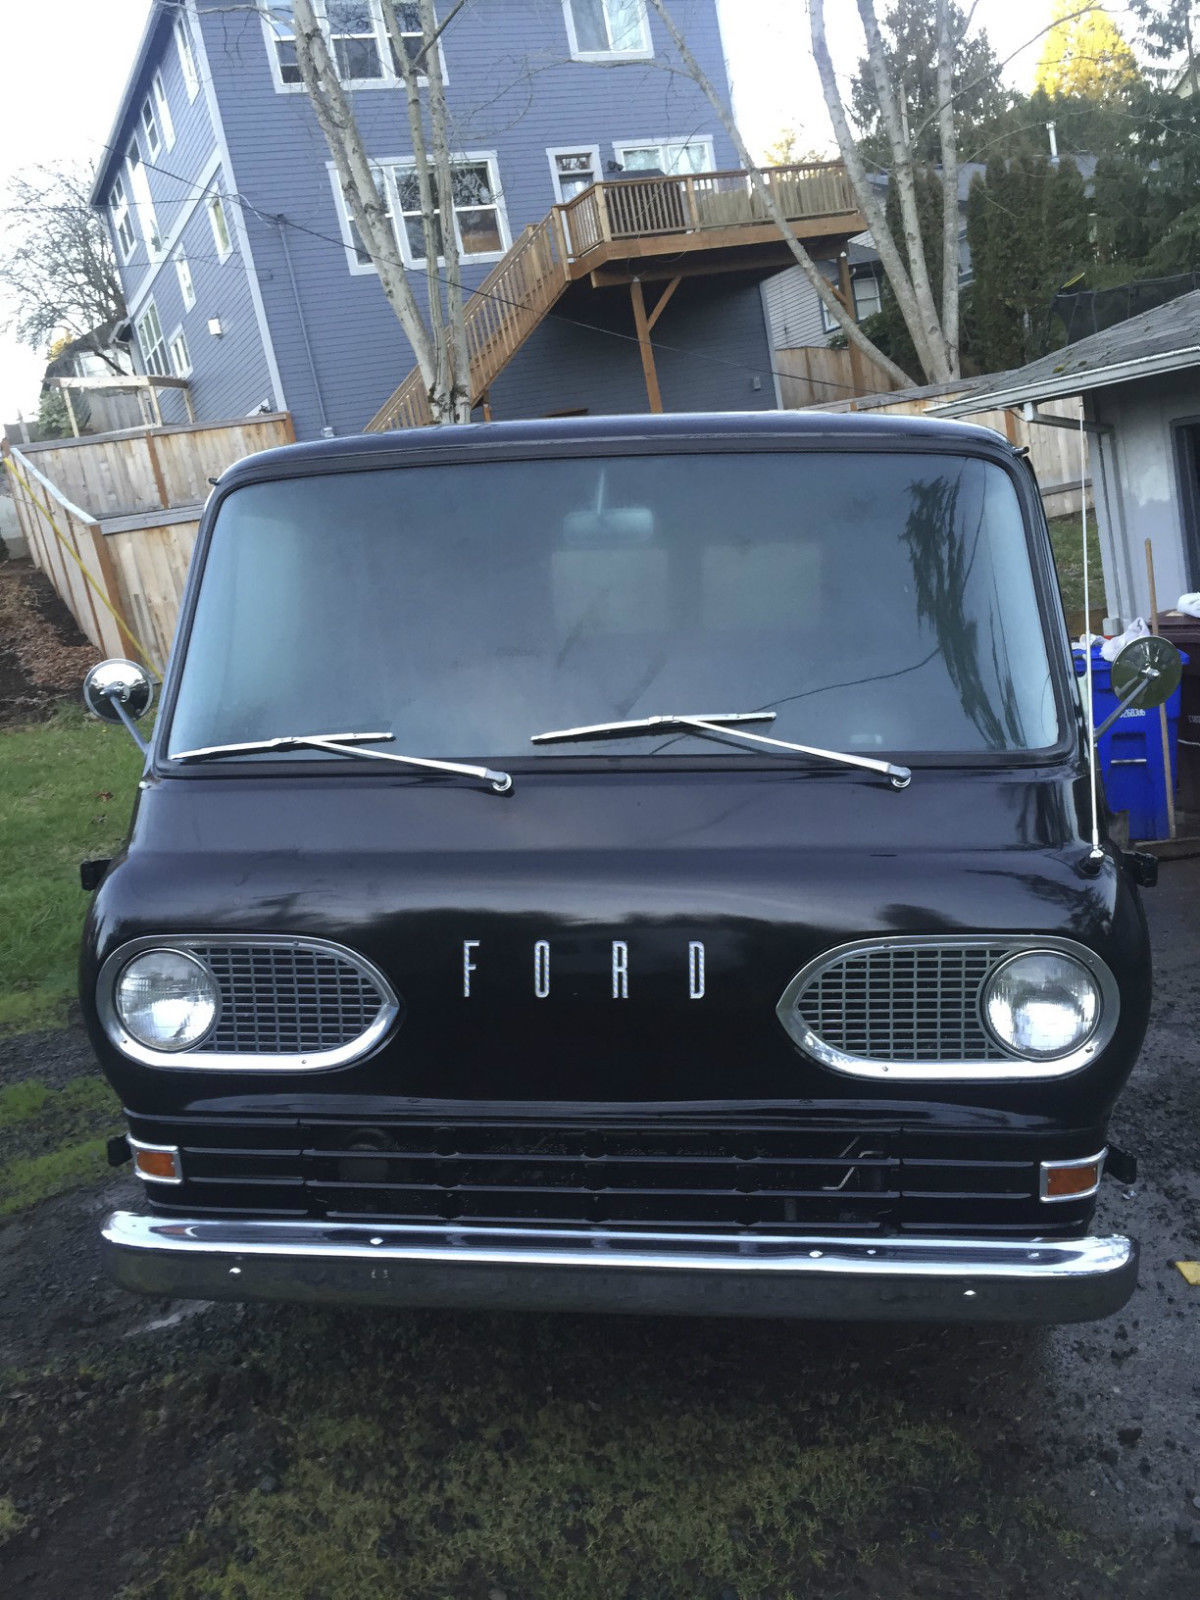 1963 Ford Econoline Van Black Panel Van Ground Up